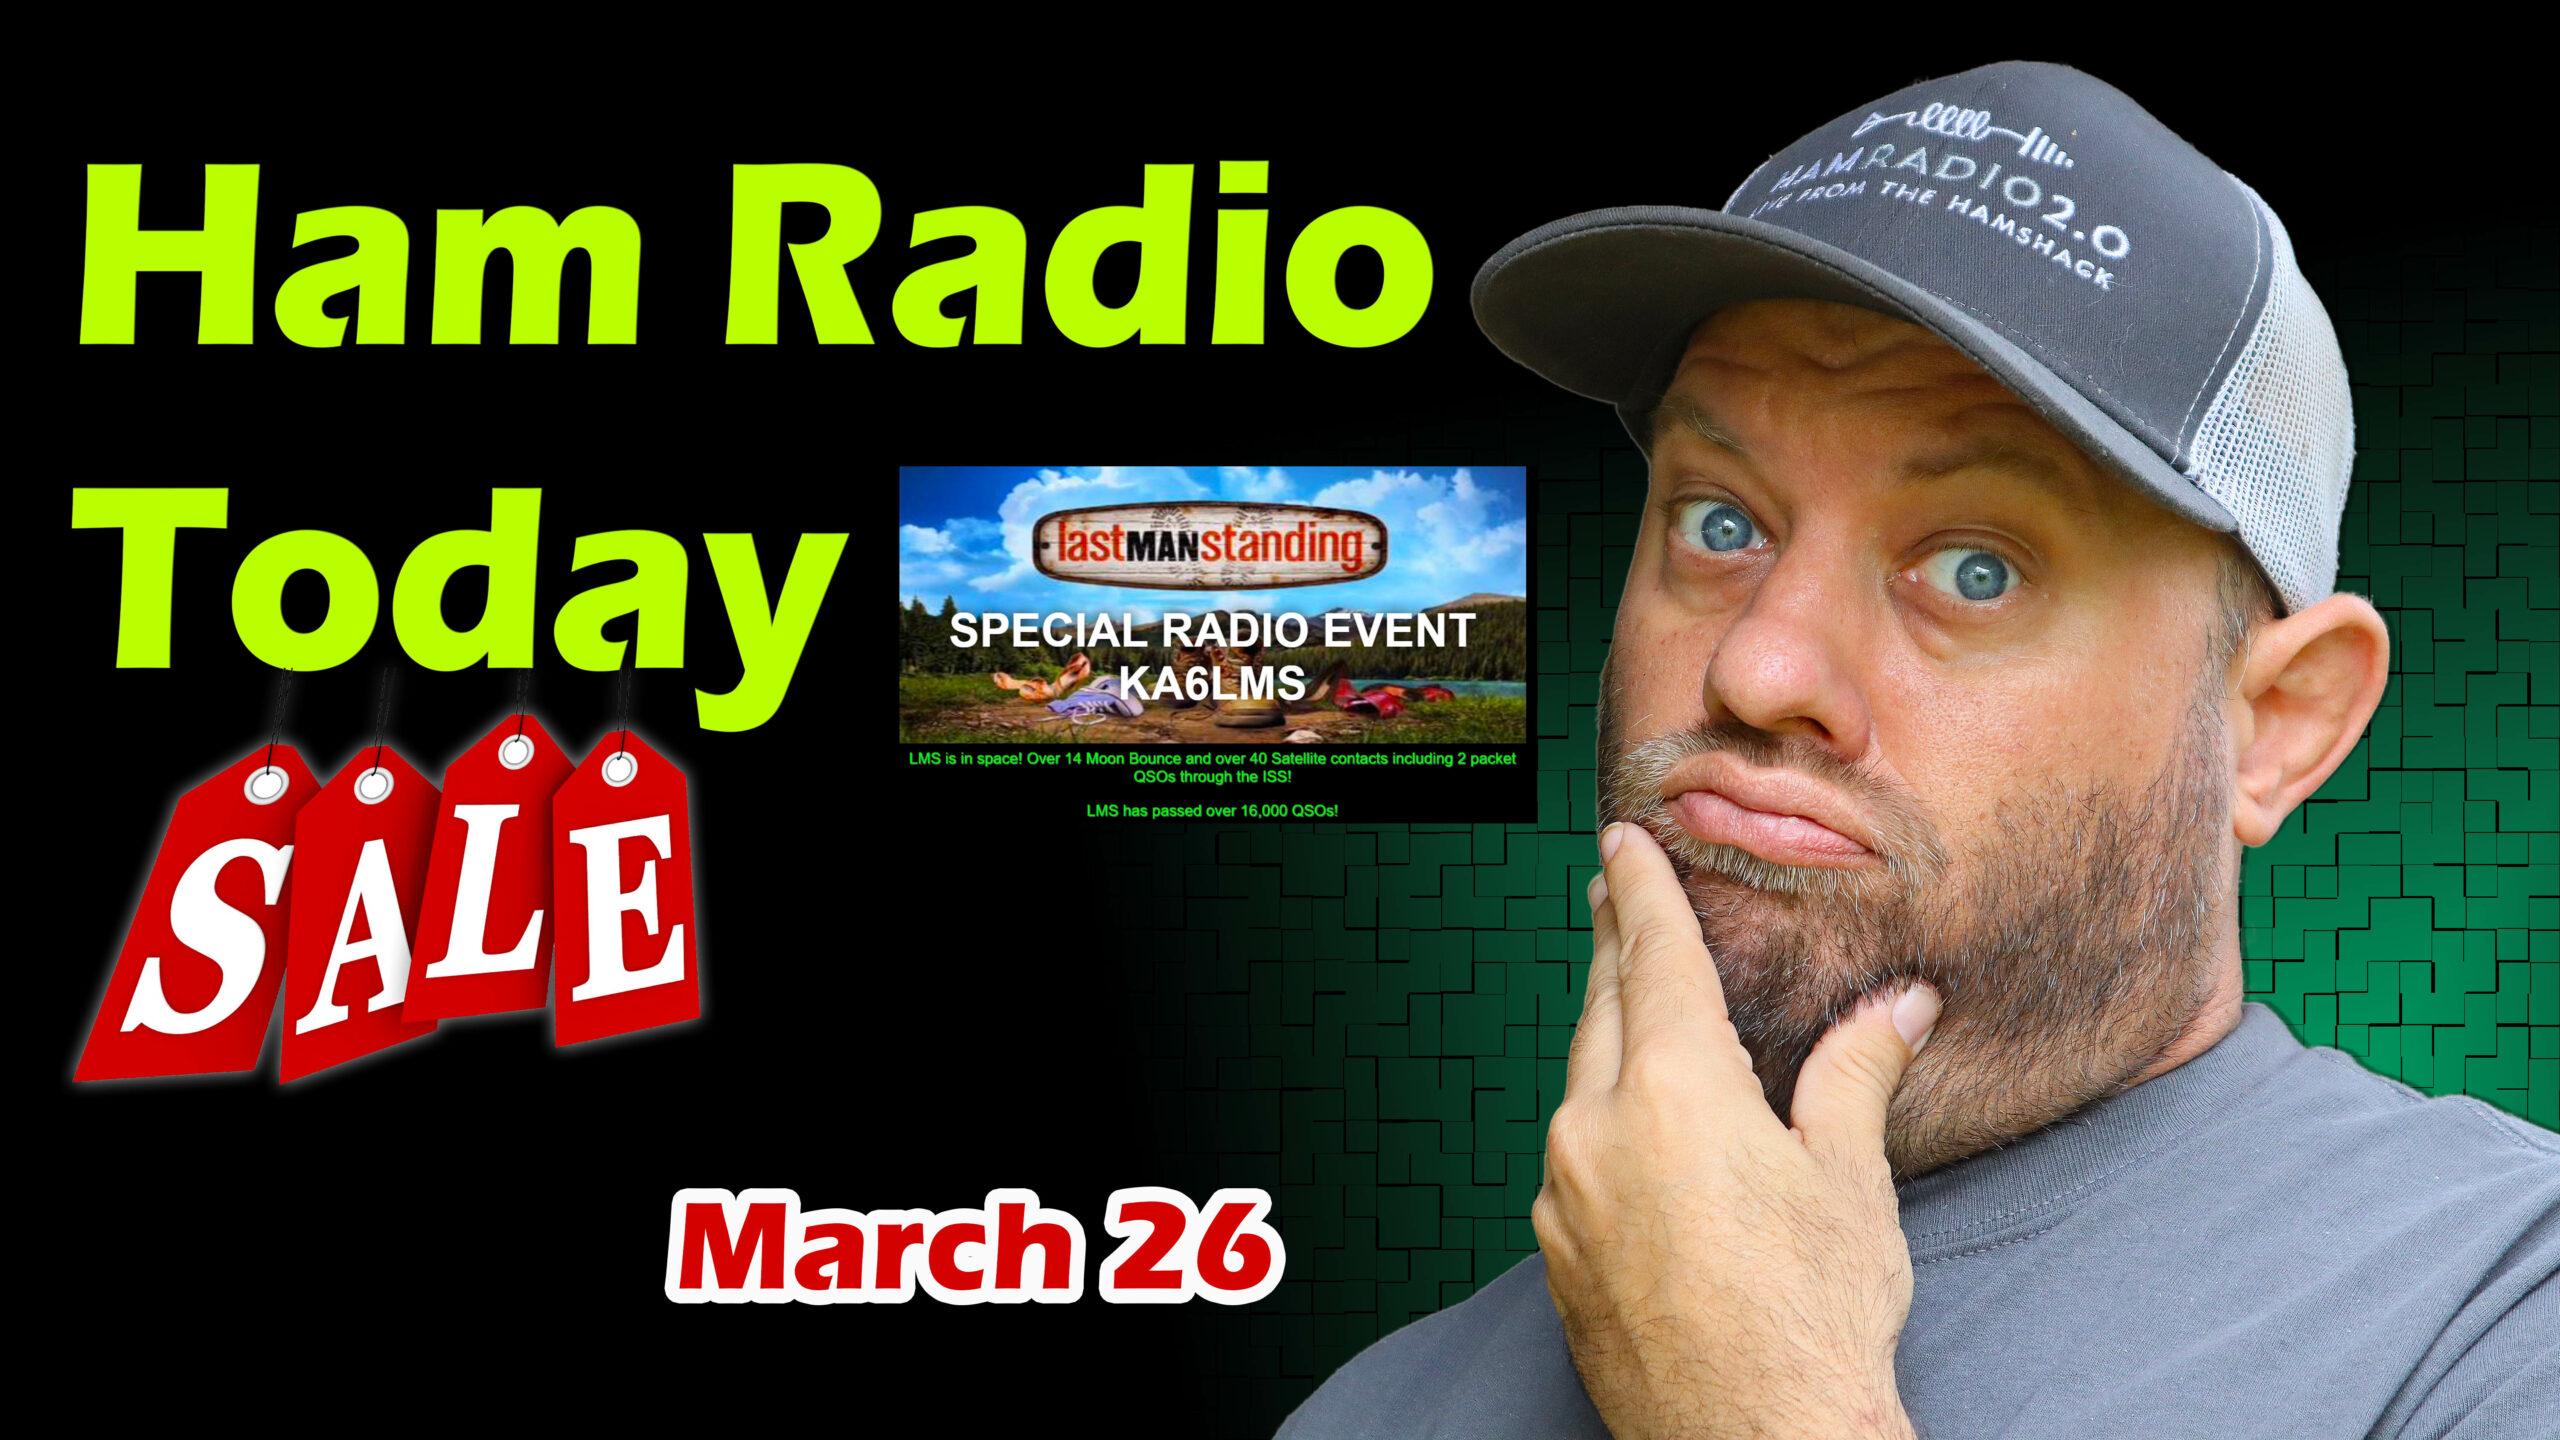 Episode 582: Ham Radio Today for March 26   Ham Radio Shopping Deals